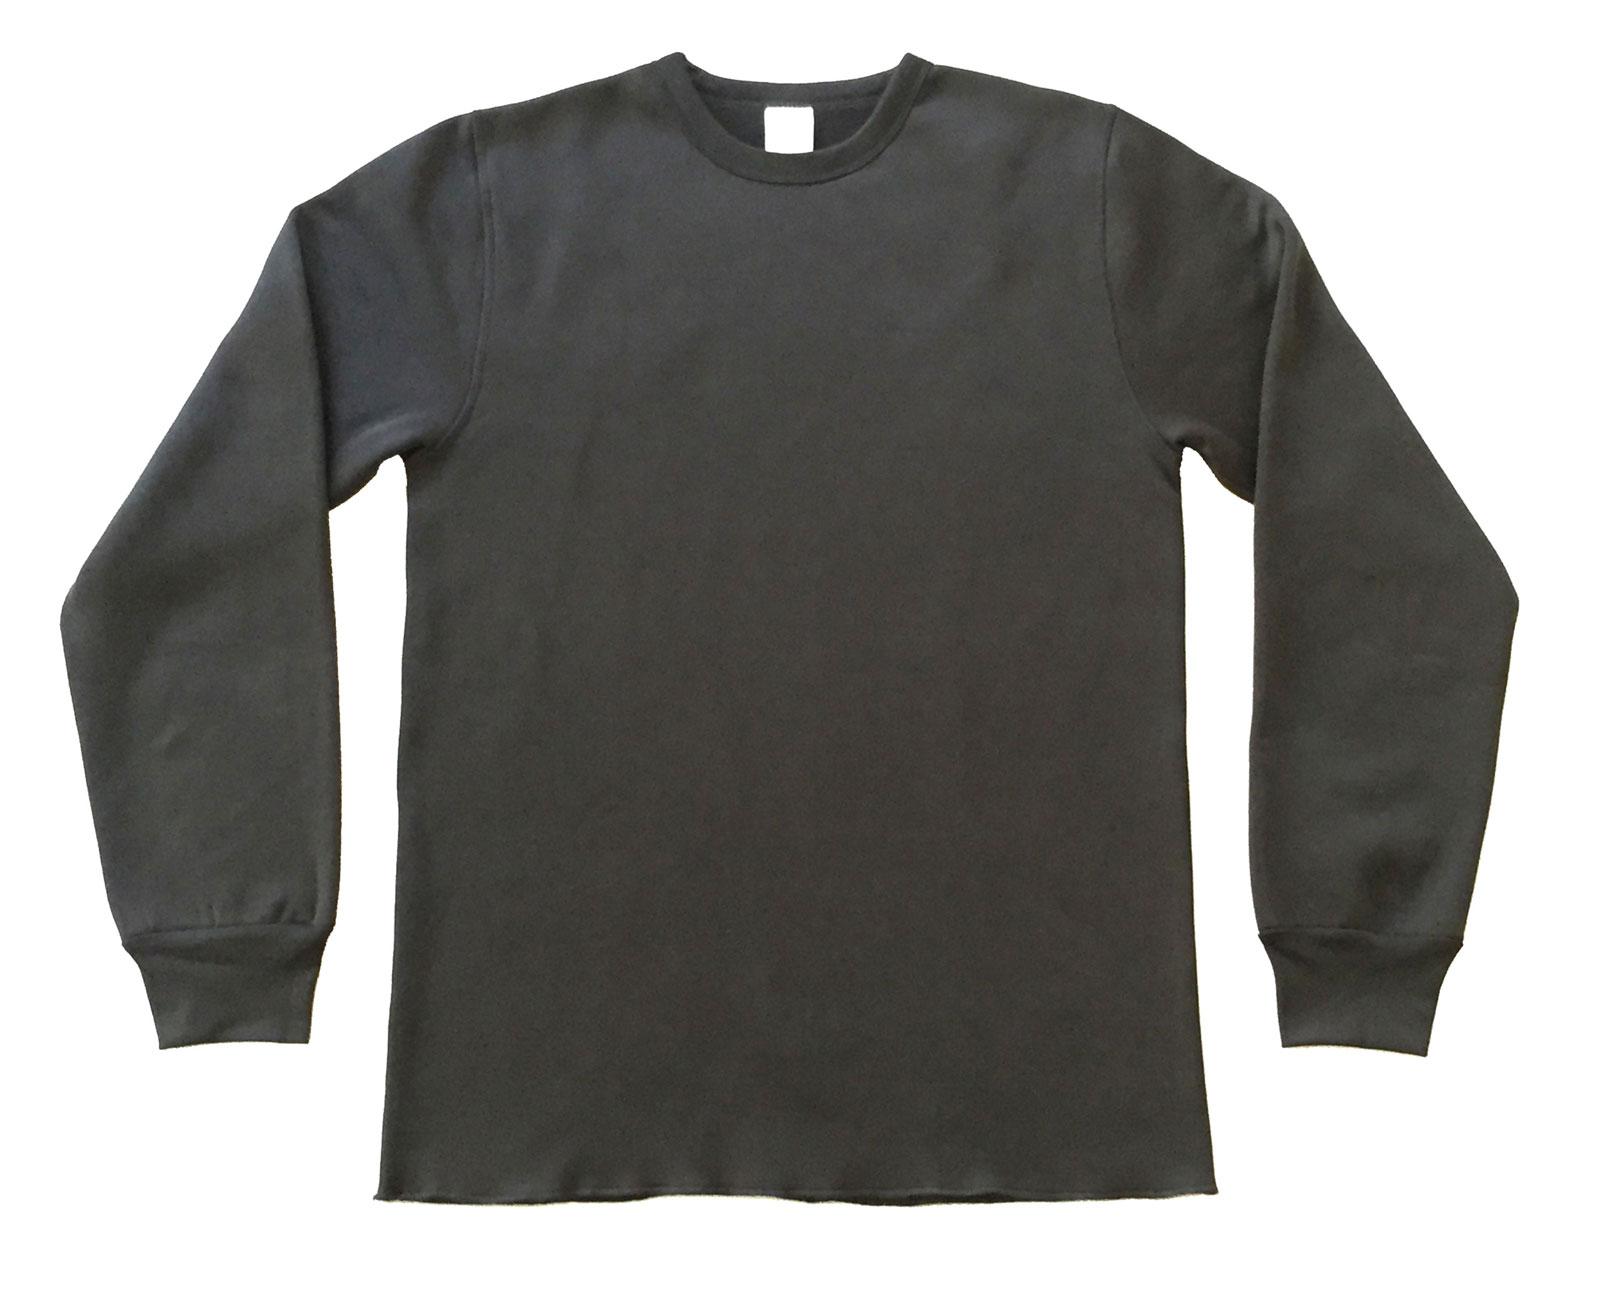 Mens Military Fleece Long Sleeve Top Black M PartNumber: 089W007909686001P KsnValue: 7909686 MfgPartNumber: K985LS